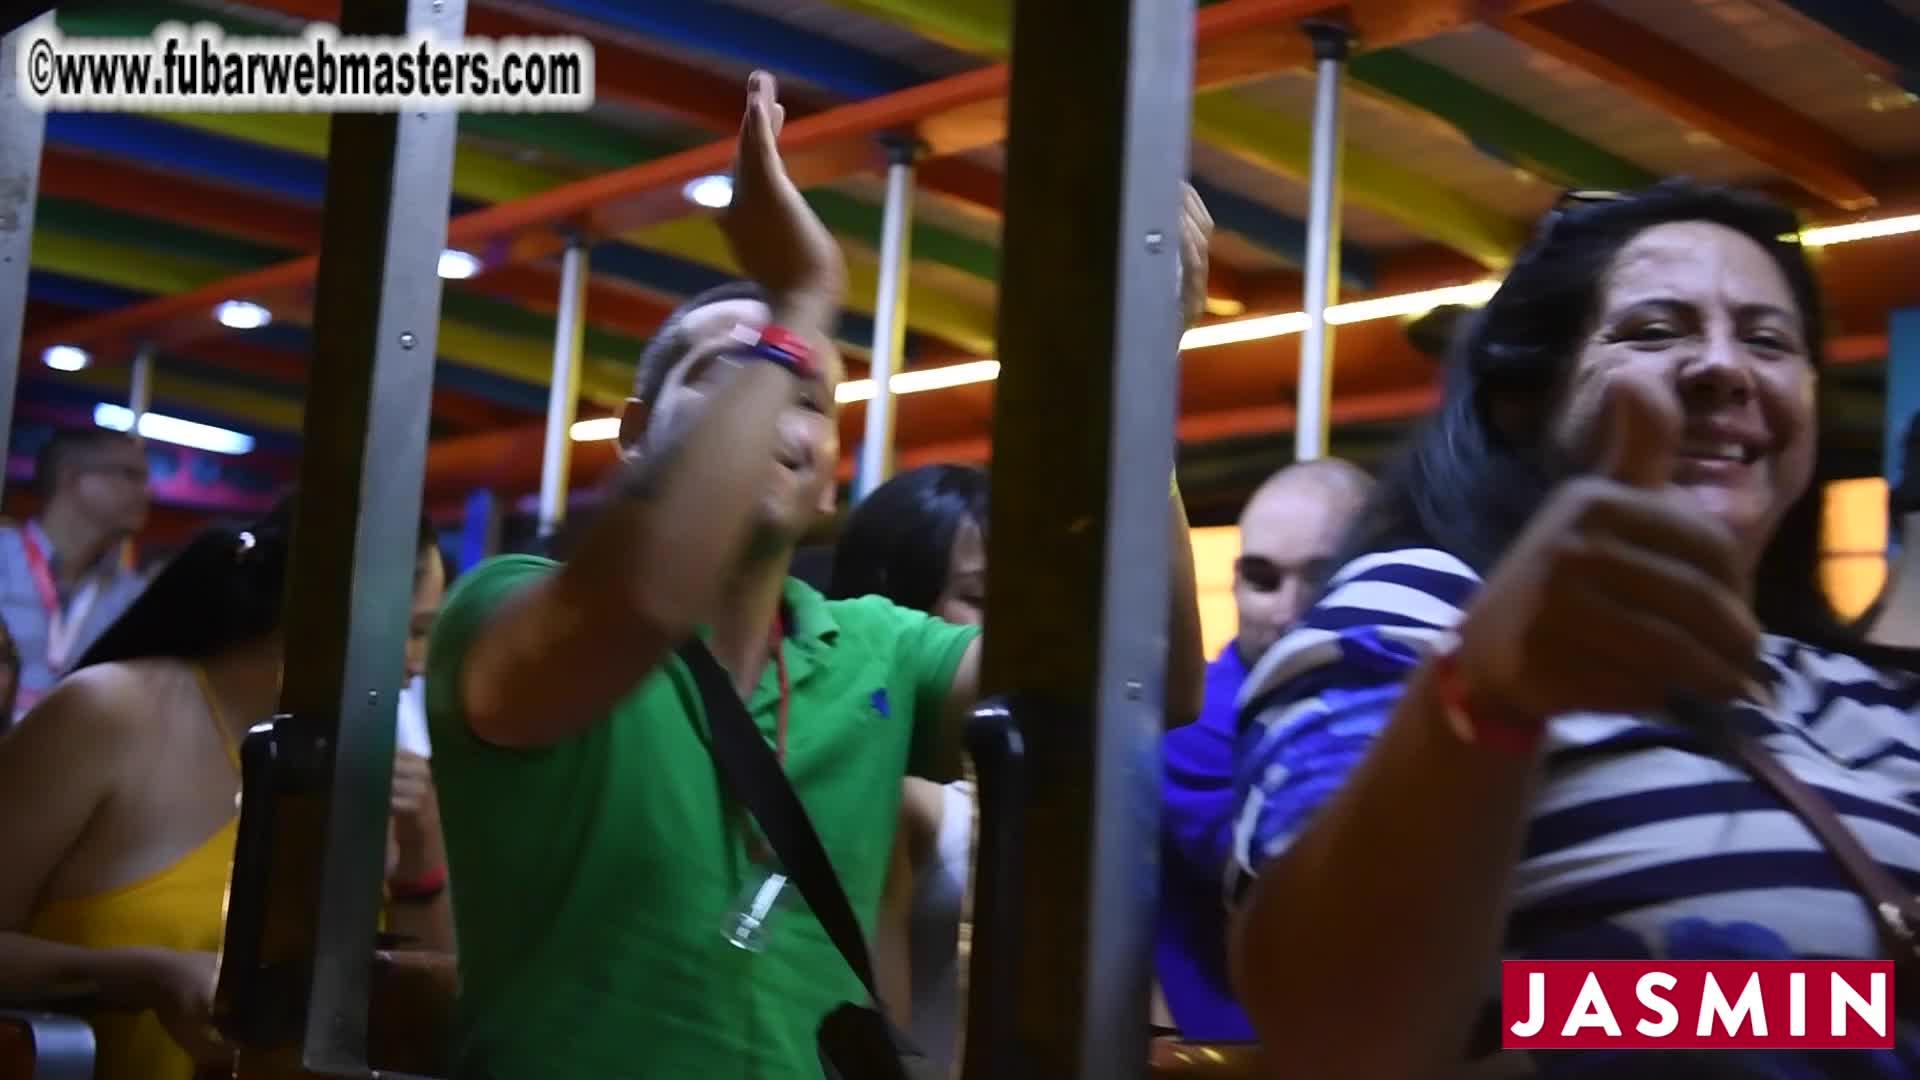 LALEXPO 2017 - CHIVA BUS - thumbnail